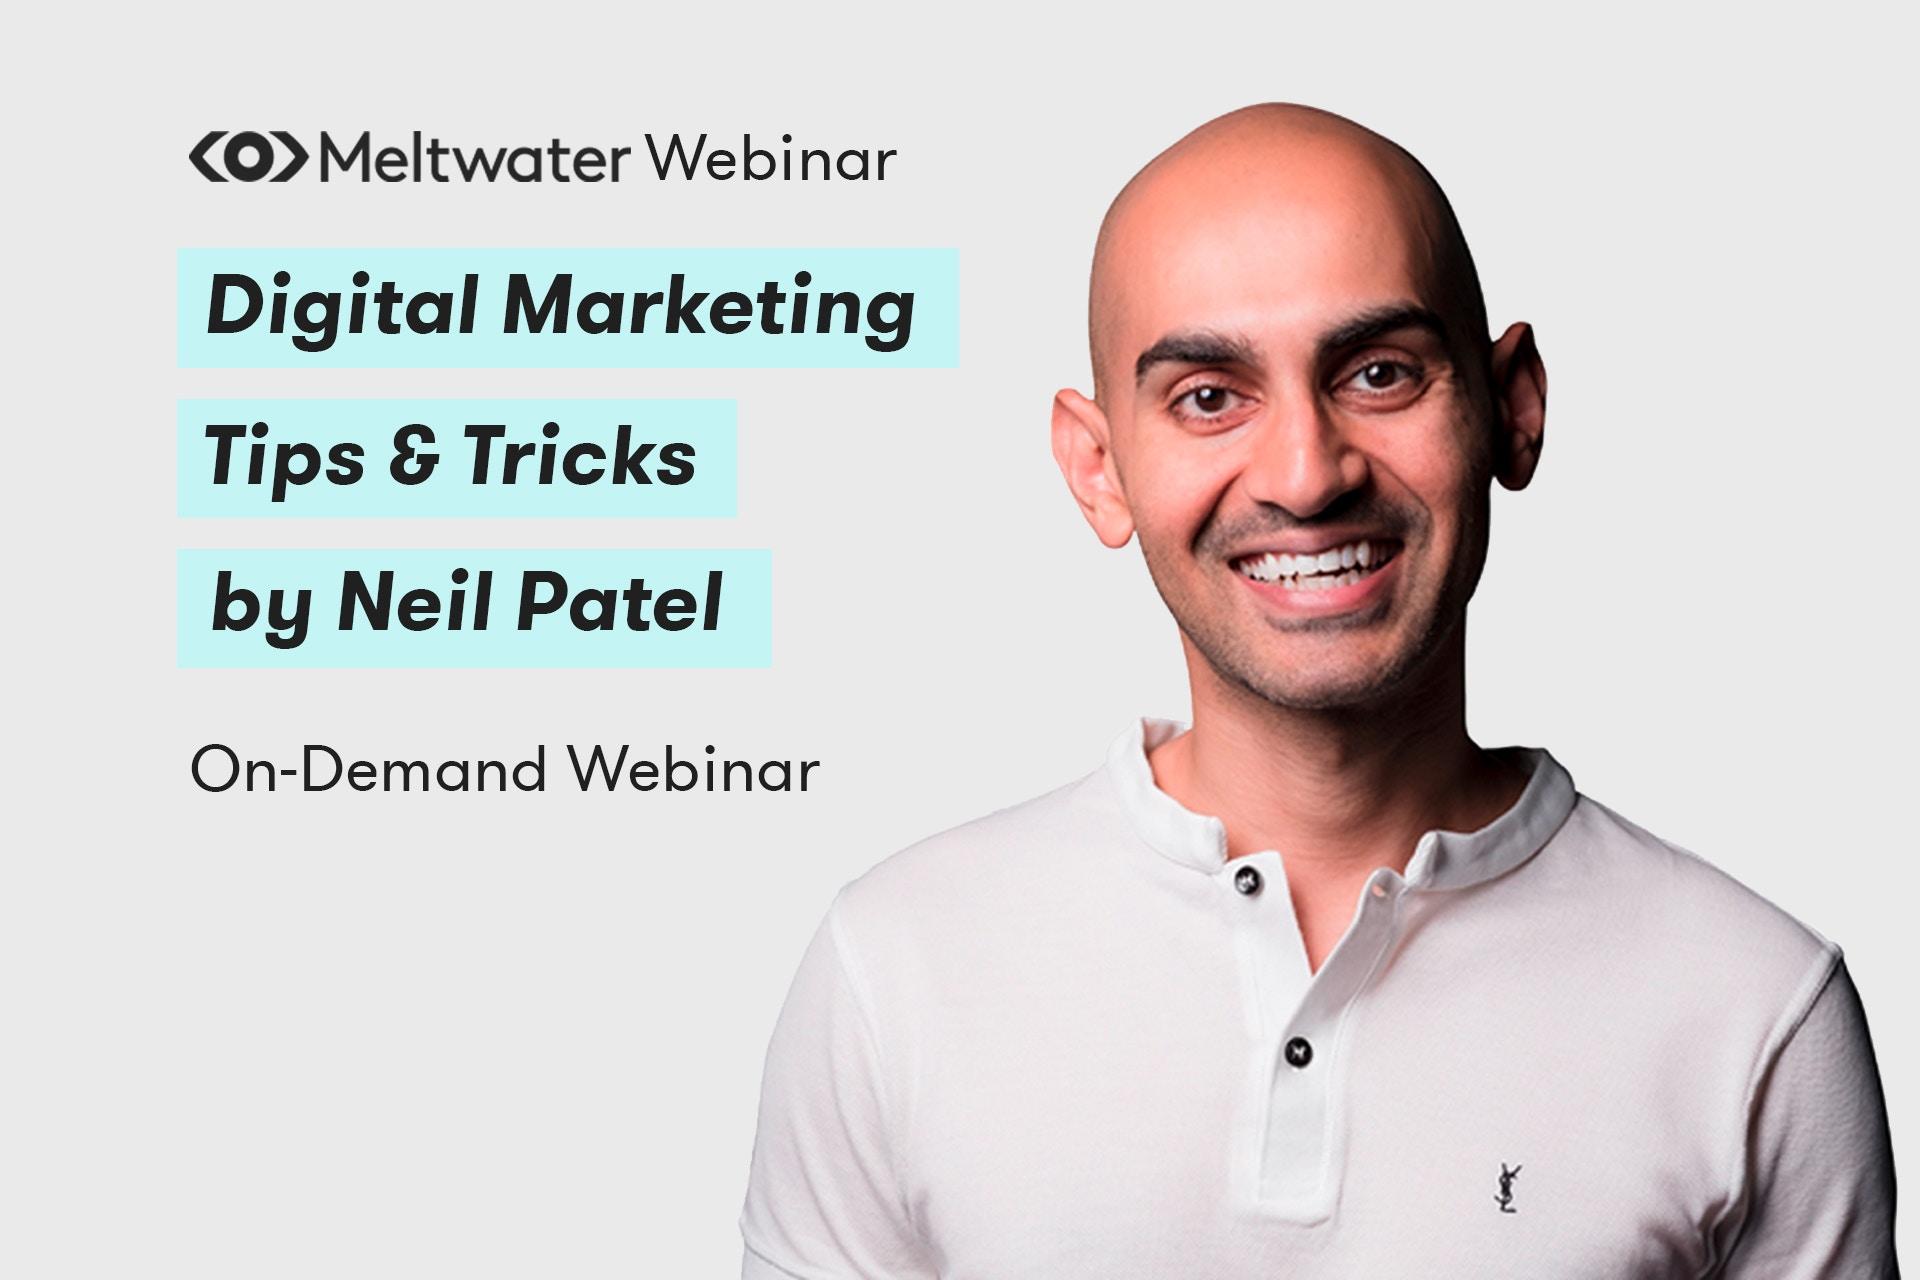 Digital Marketing Tips & Tricks with Neil Patel - Meltwater Webinar